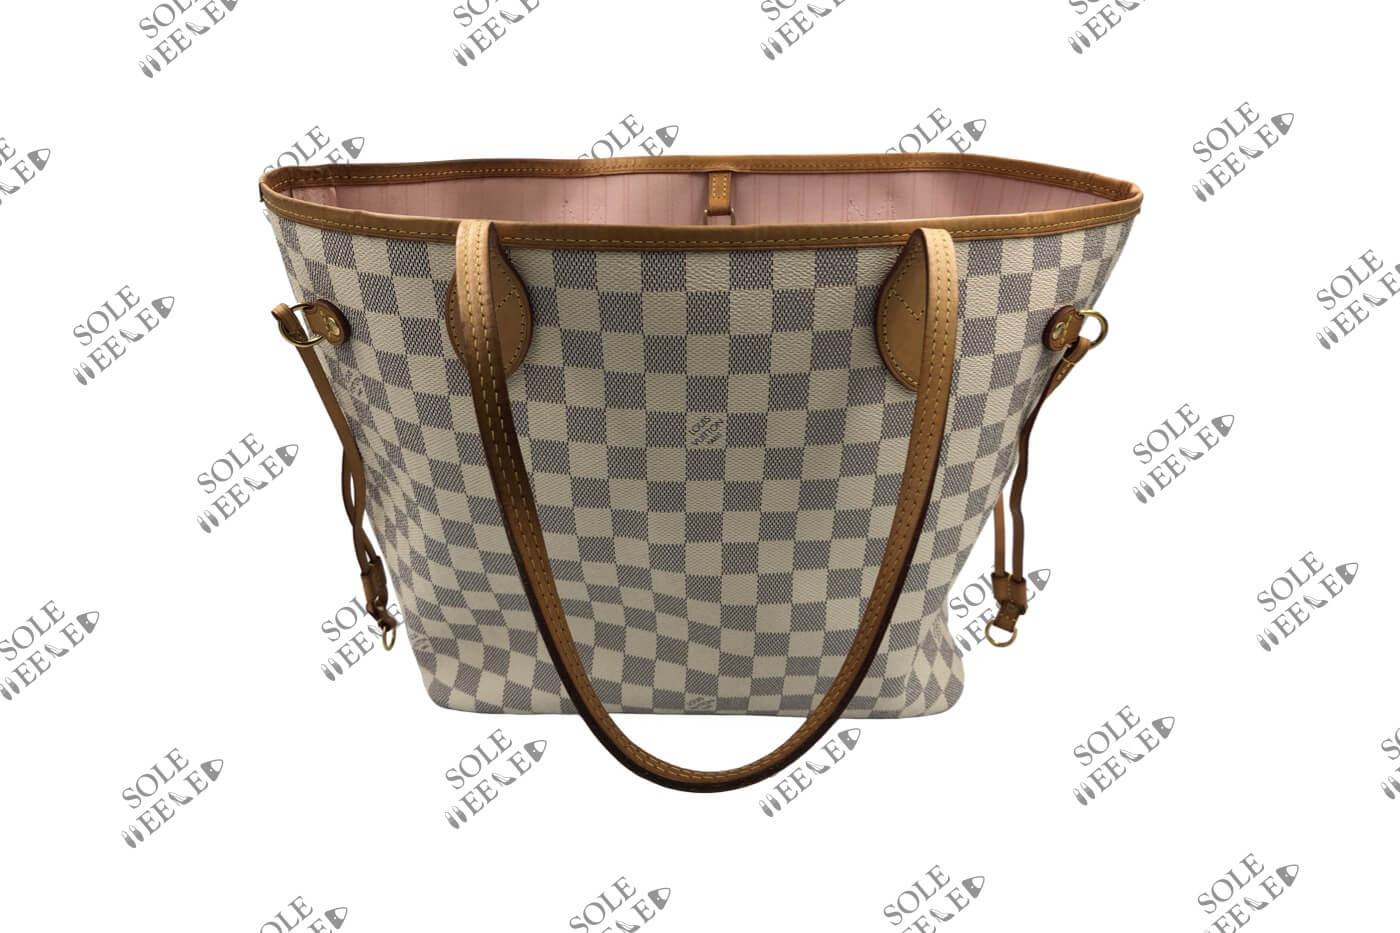 Louis Vuitton Handbag Interior Clean Soleheeled